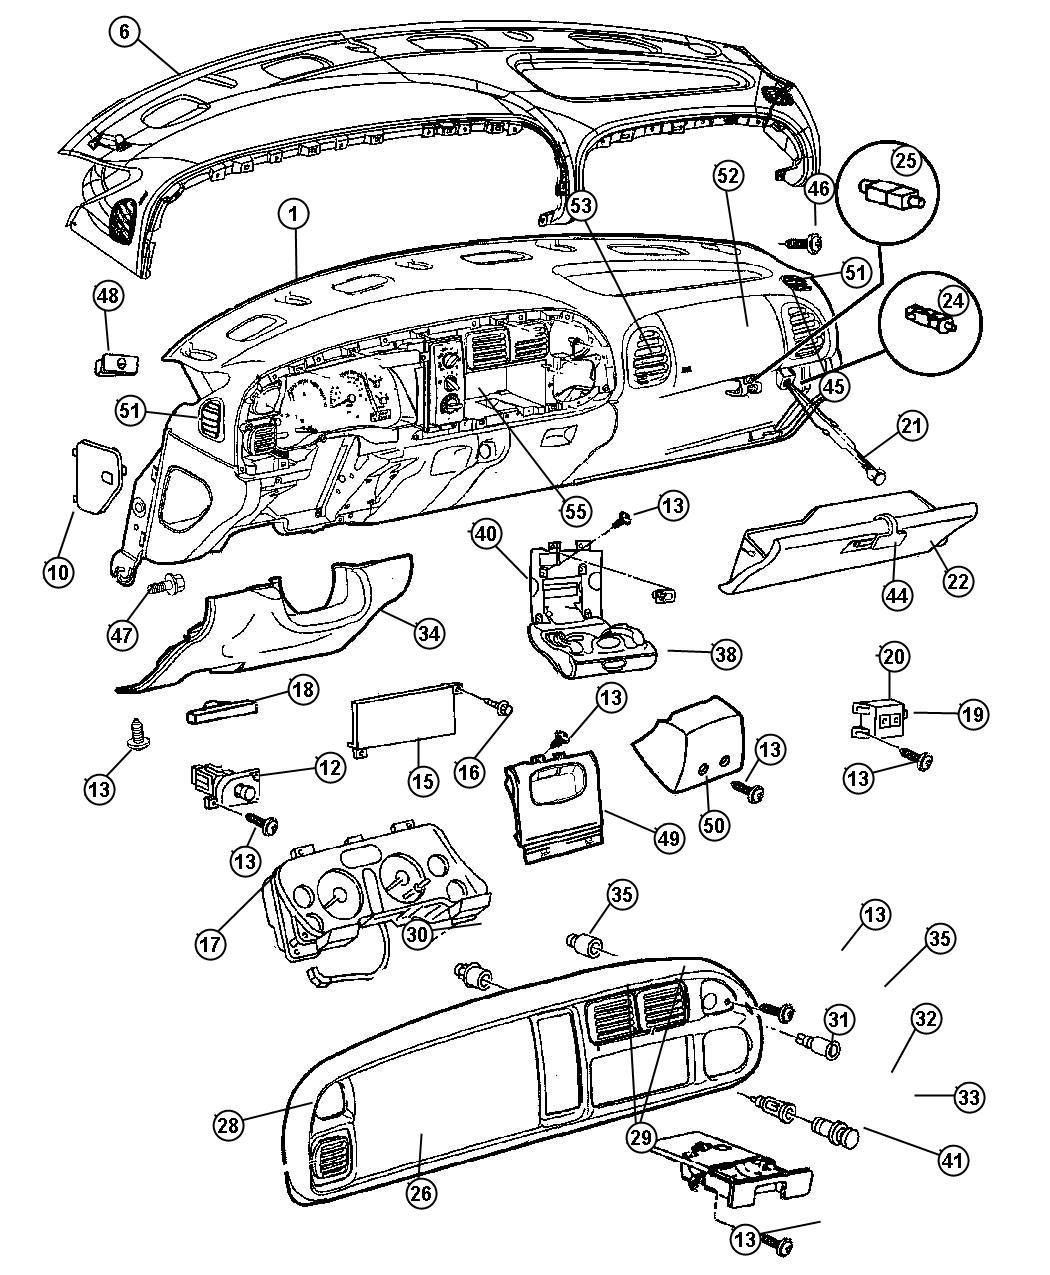 Dodge Dakota Instrument Cluster Wiring Diagram